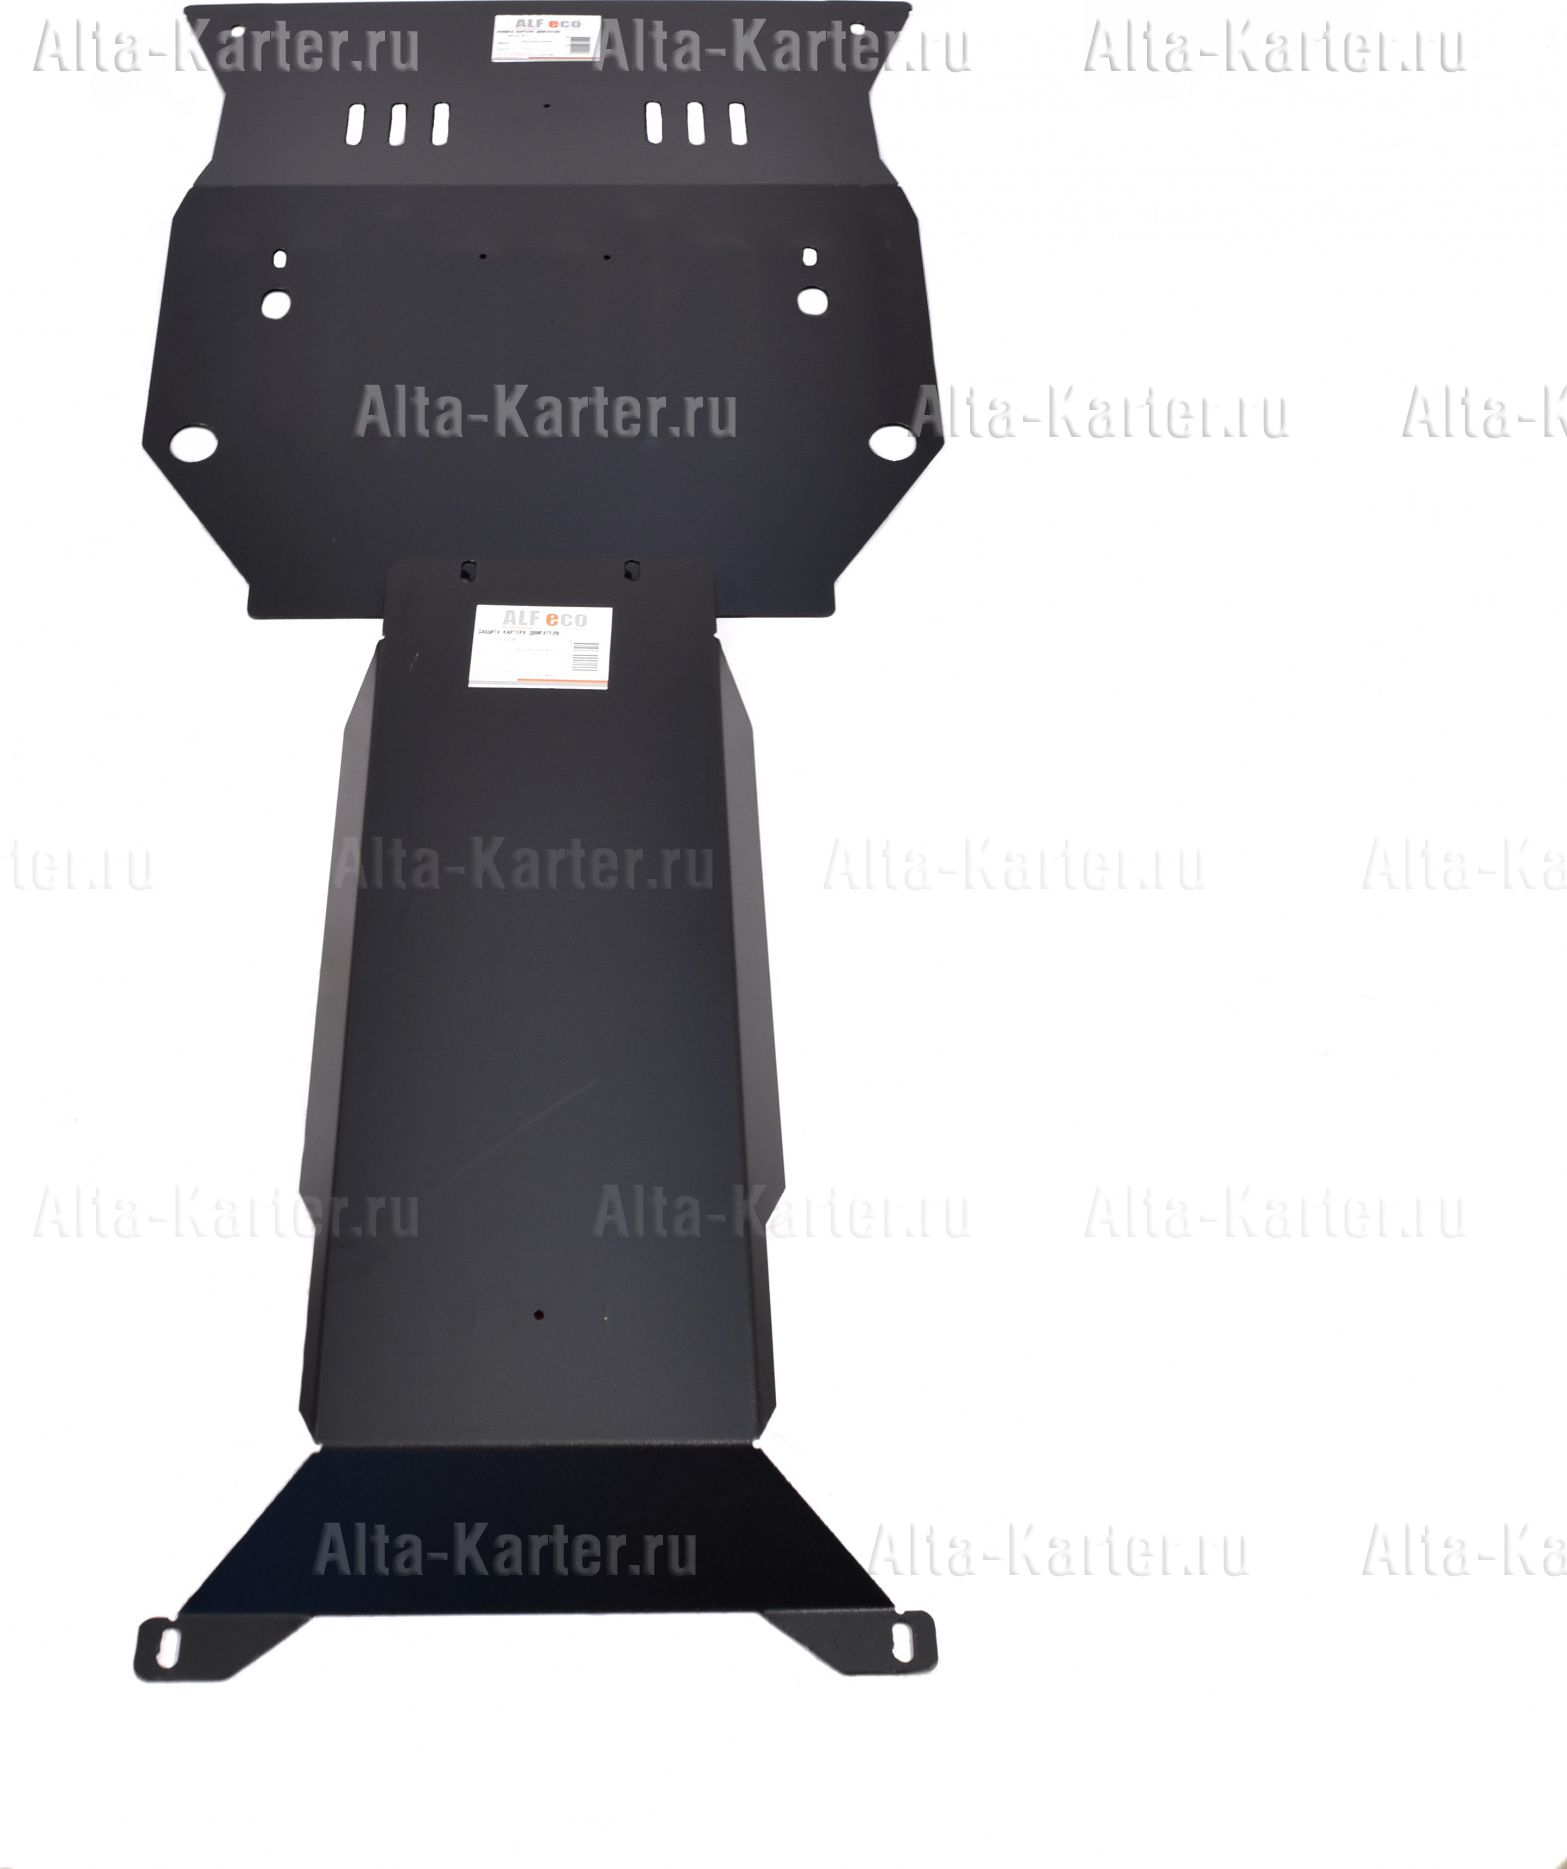 Защита Alfeco для картера и КПП Chevrolet Camaro 2010-2021. Артикул ALF.03.22